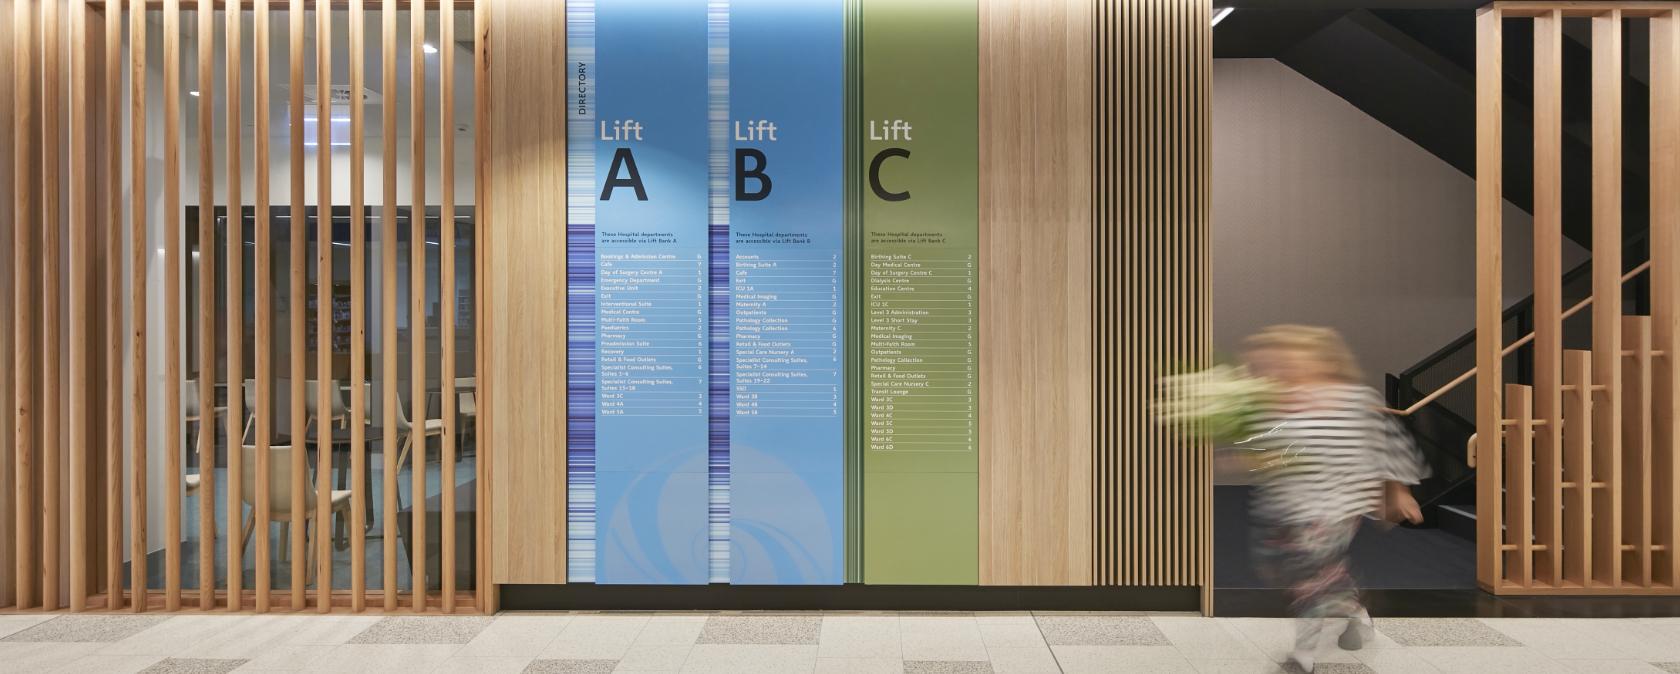 A person walks quickly through a lift foyer